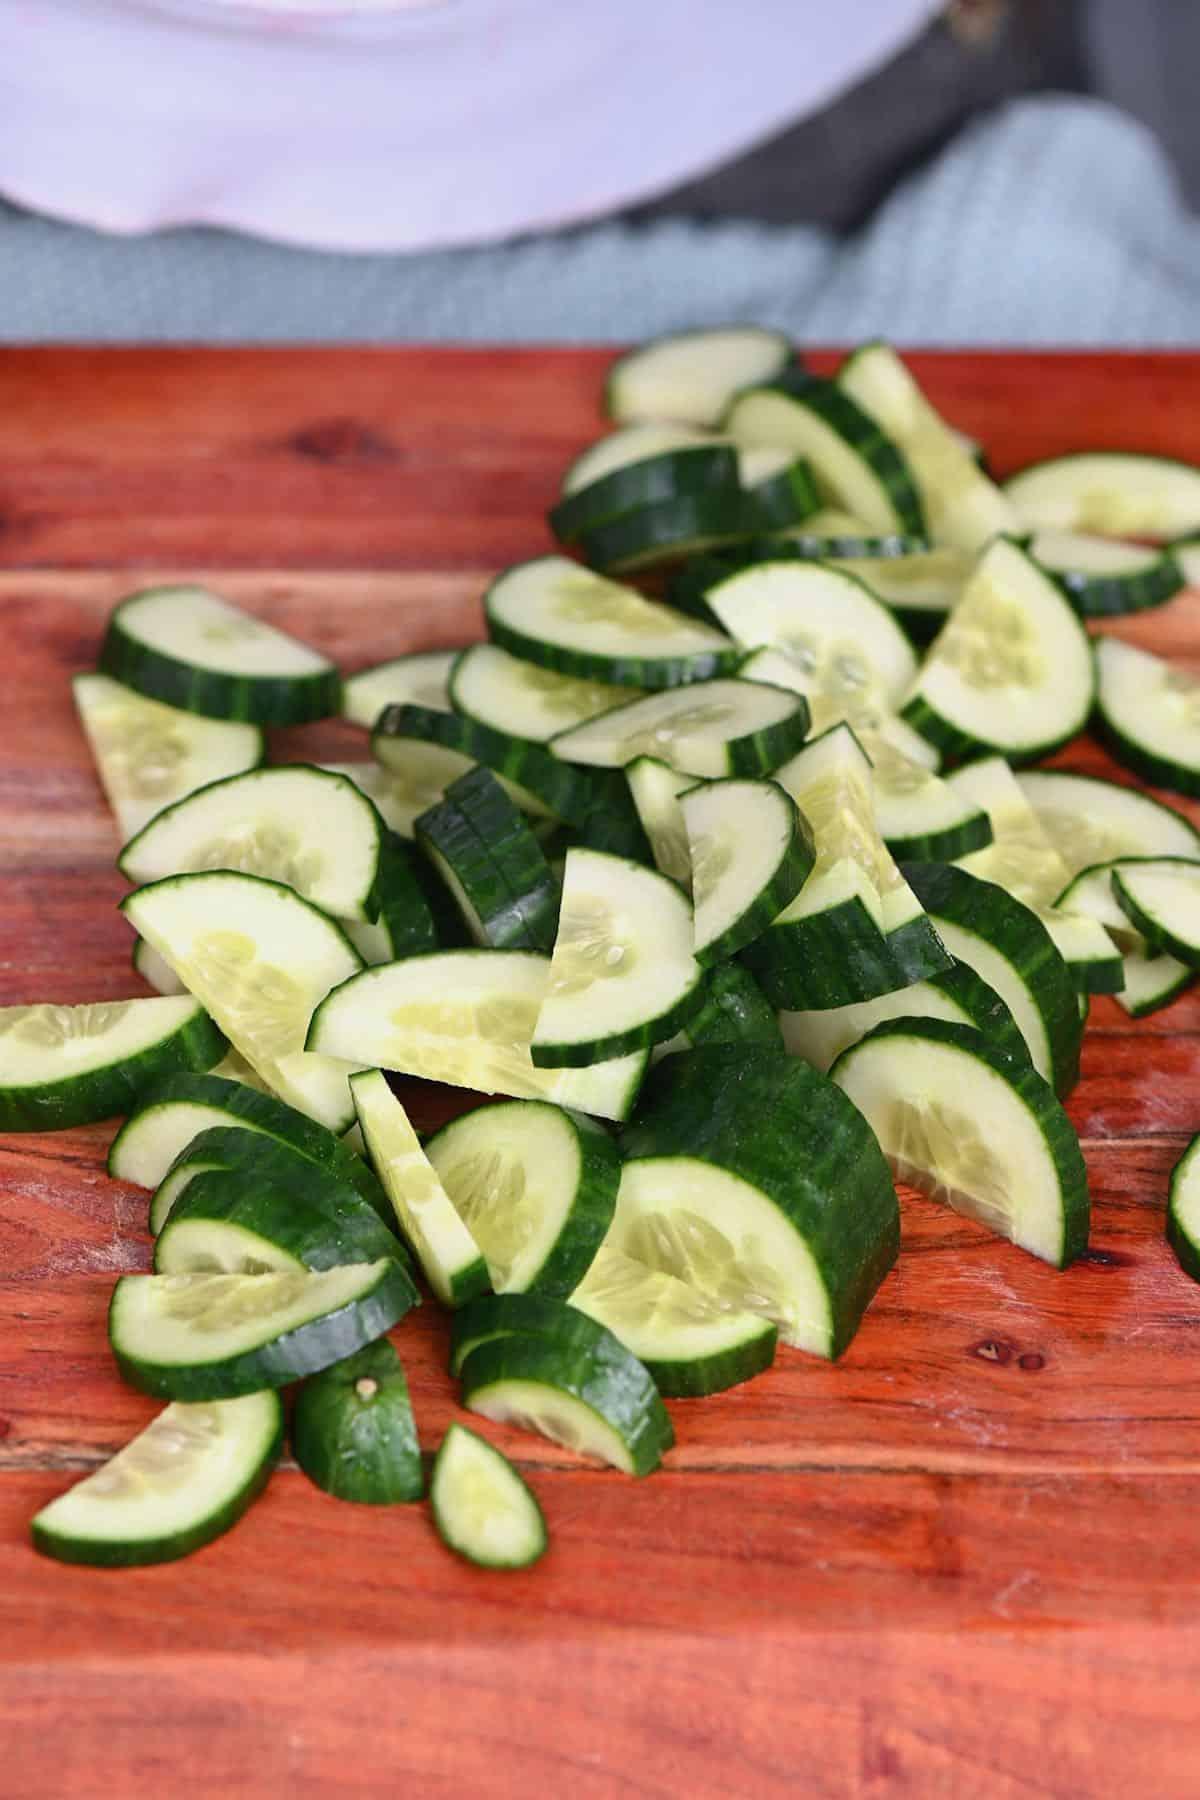 Chopped cucumber on cutting board